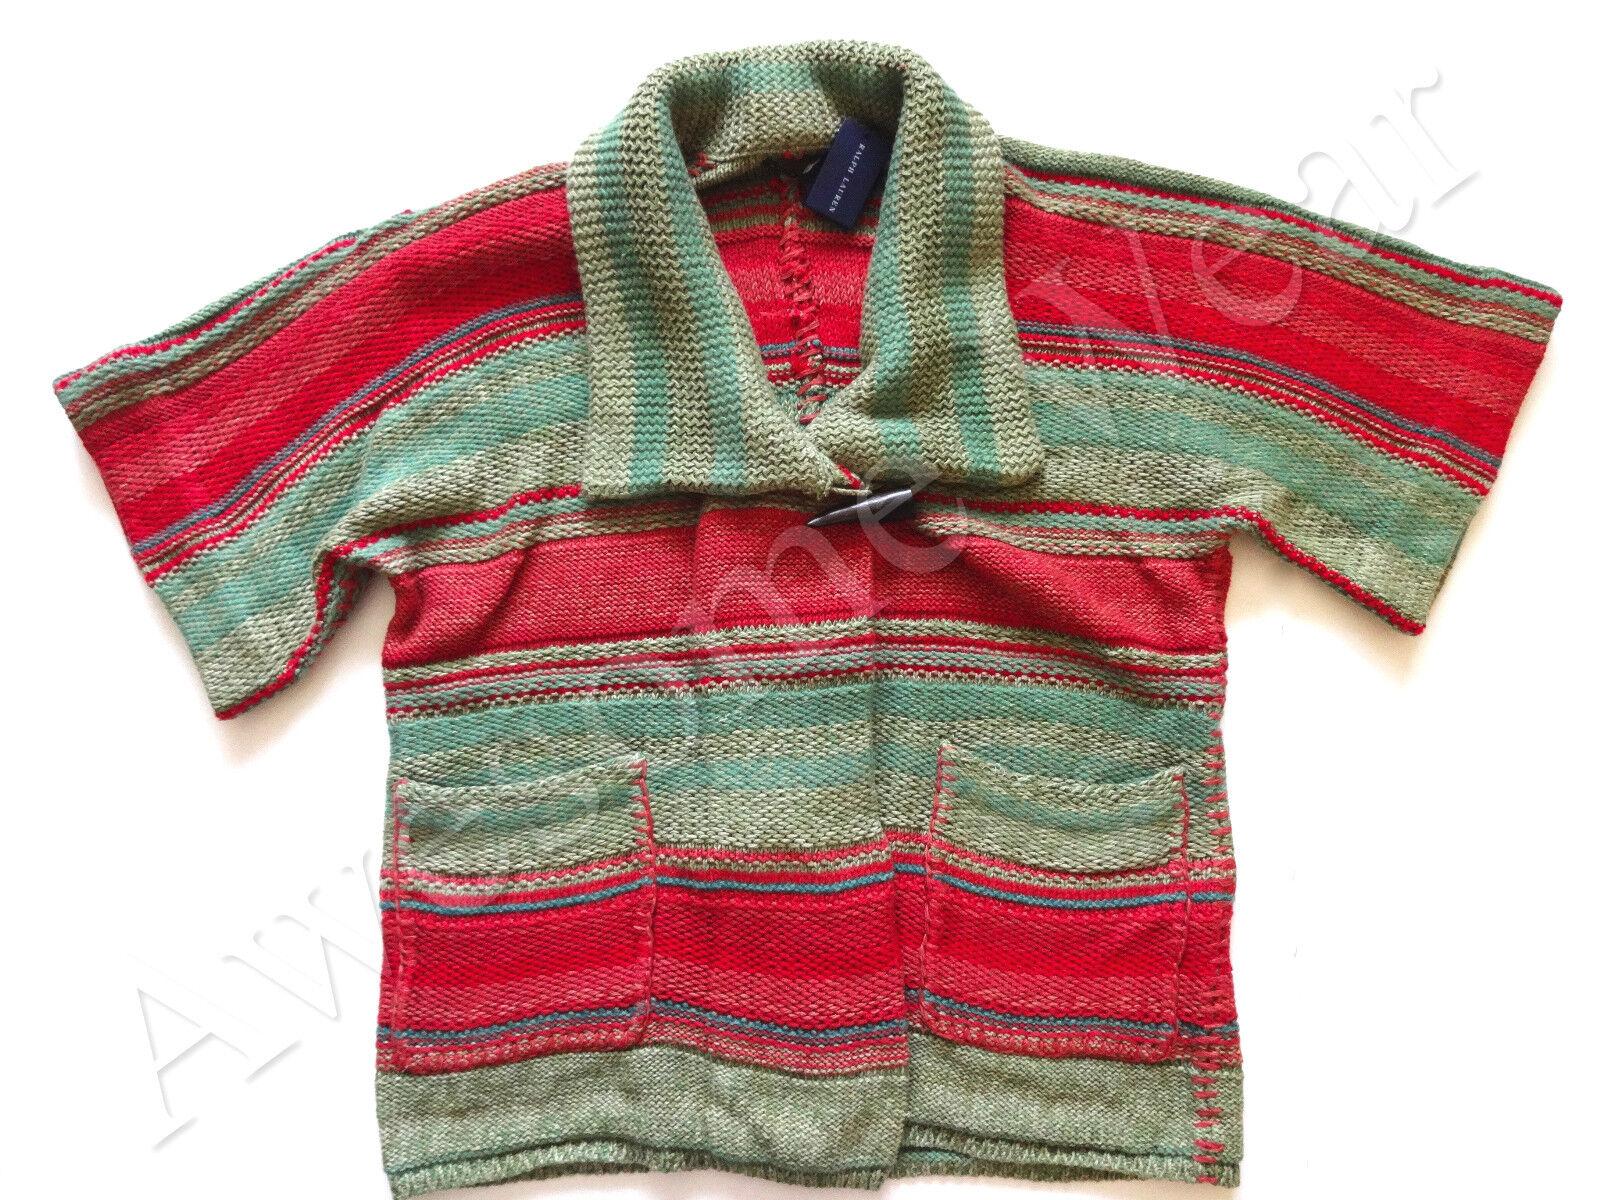 New Ralph Lauren Polo Women's Serape Cotton & Cashmere Cardigan Sweater sz M